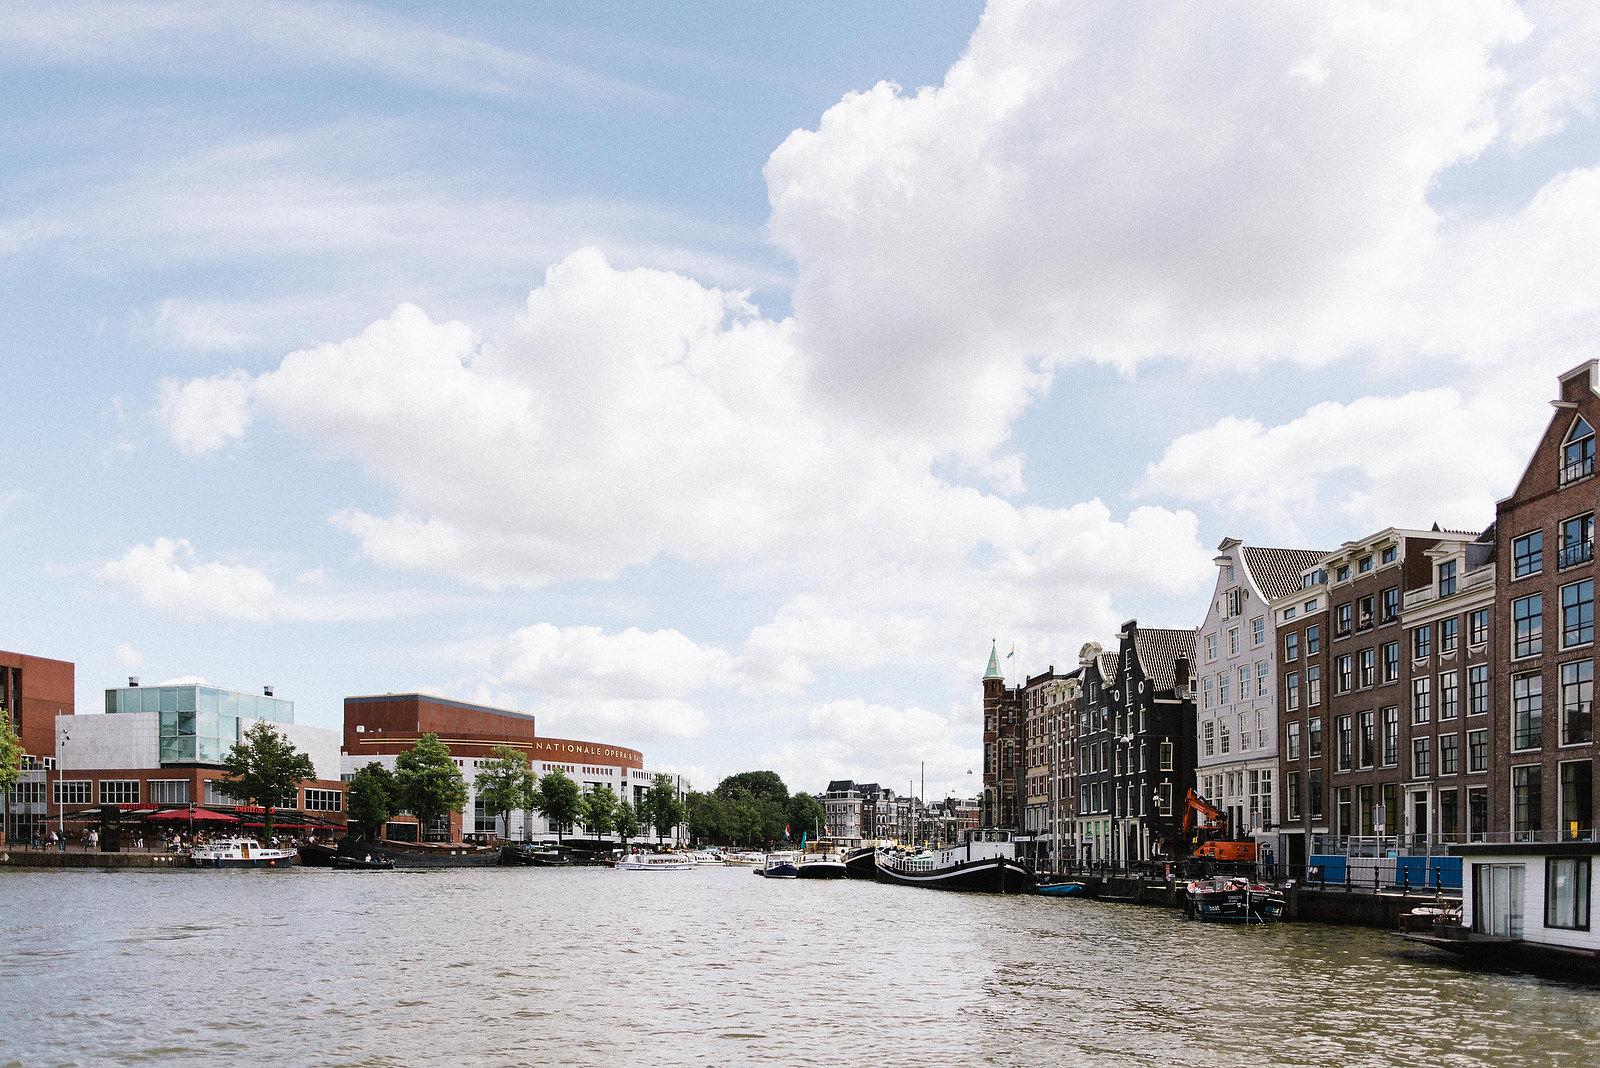 Fotograf Konstanz - Destination Wedding Photographer Amsterdam 060 - Destination Wedding Amsterdam  - 168 -